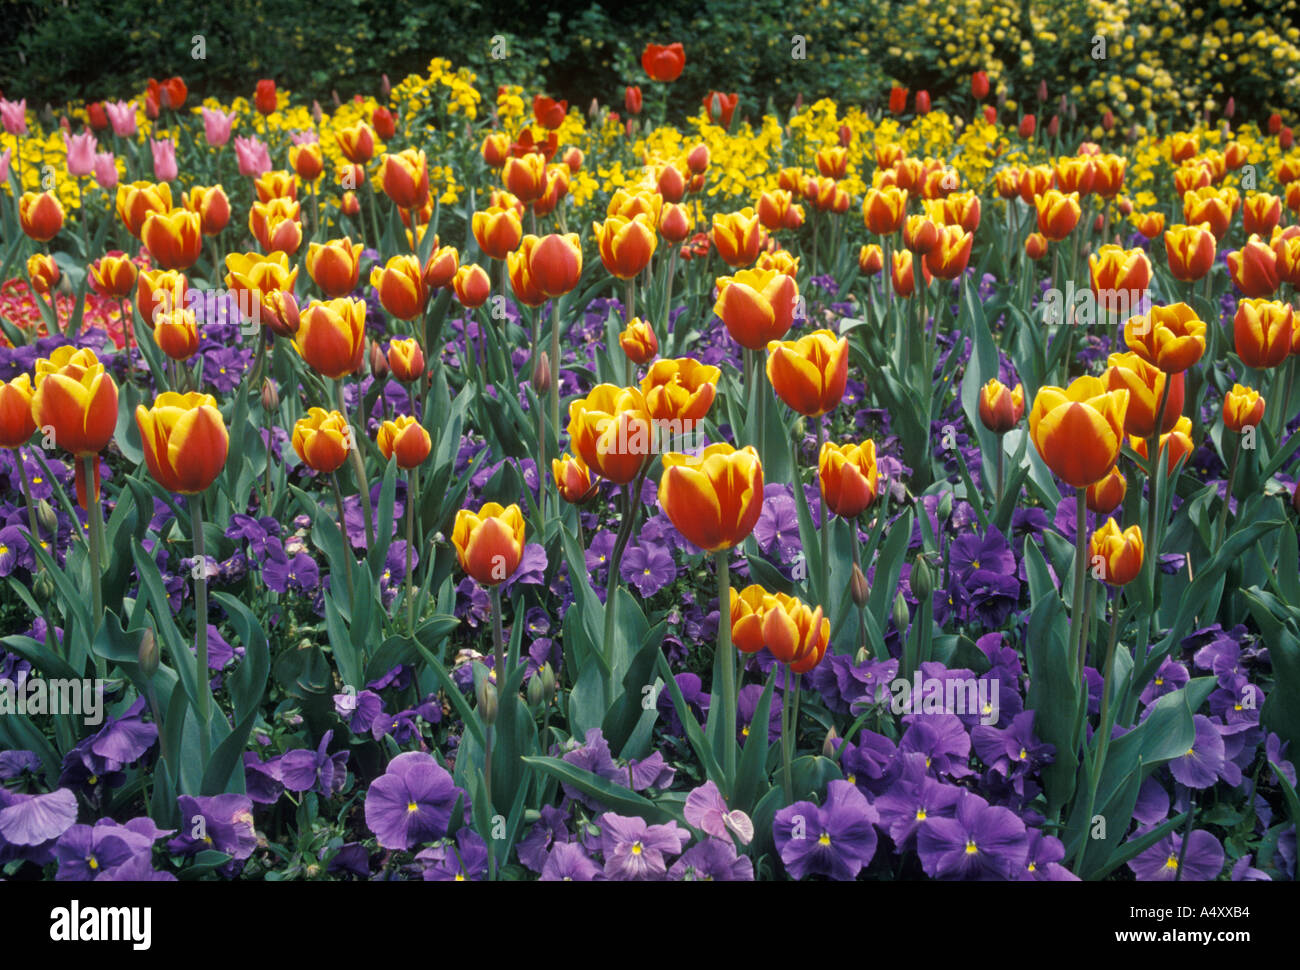 tulips st james park london stockfotos tulips st james park london bilder alamy. Black Bedroom Furniture Sets. Home Design Ideas